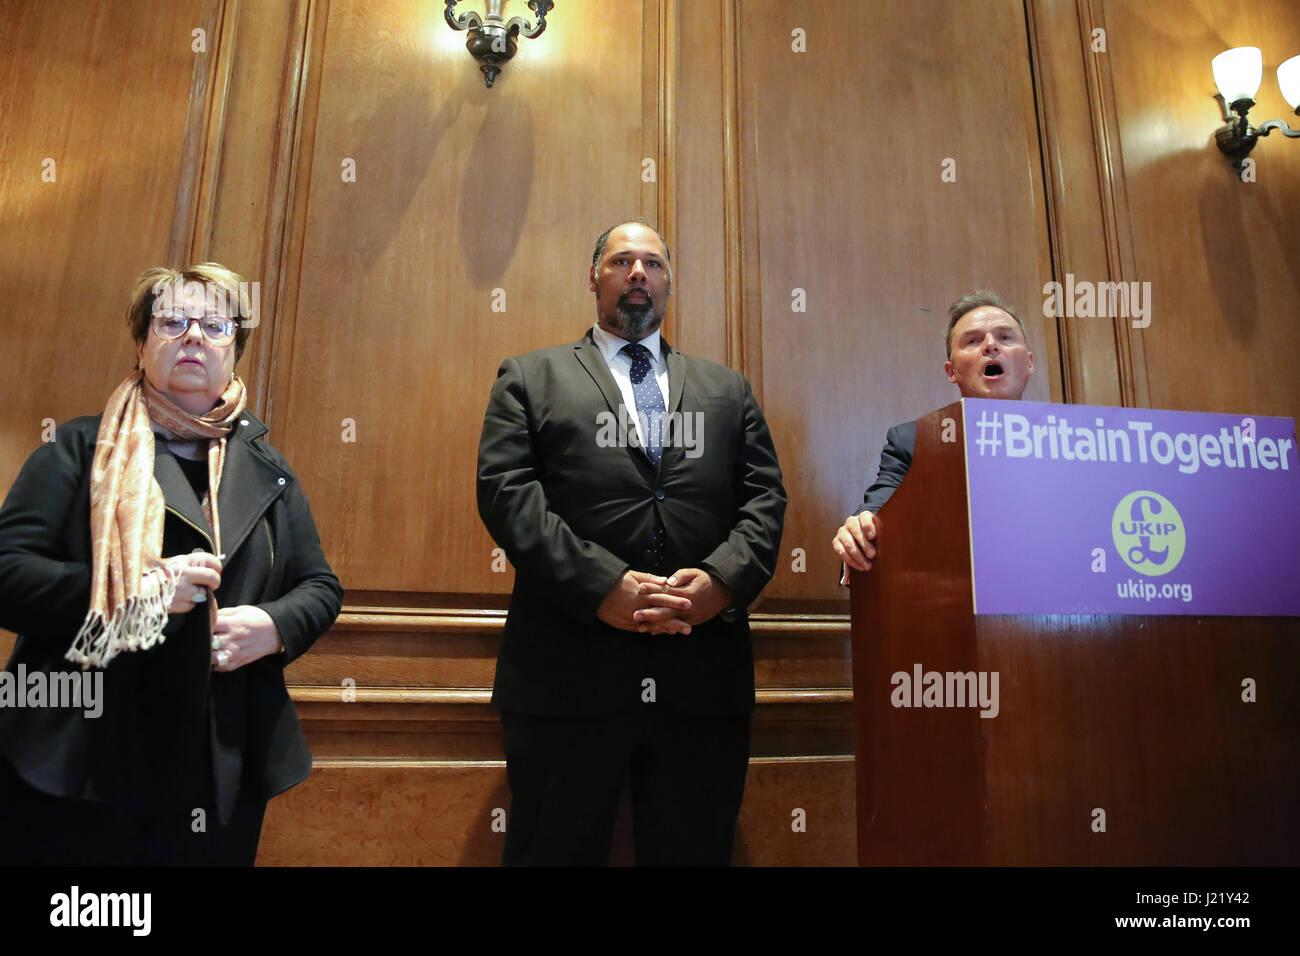 London, UK. 24th April, 2017. UKIP Women and Equalities Spokesman Westminster, London. UK 24 Apr 2017. Margot Parker Stock Photo